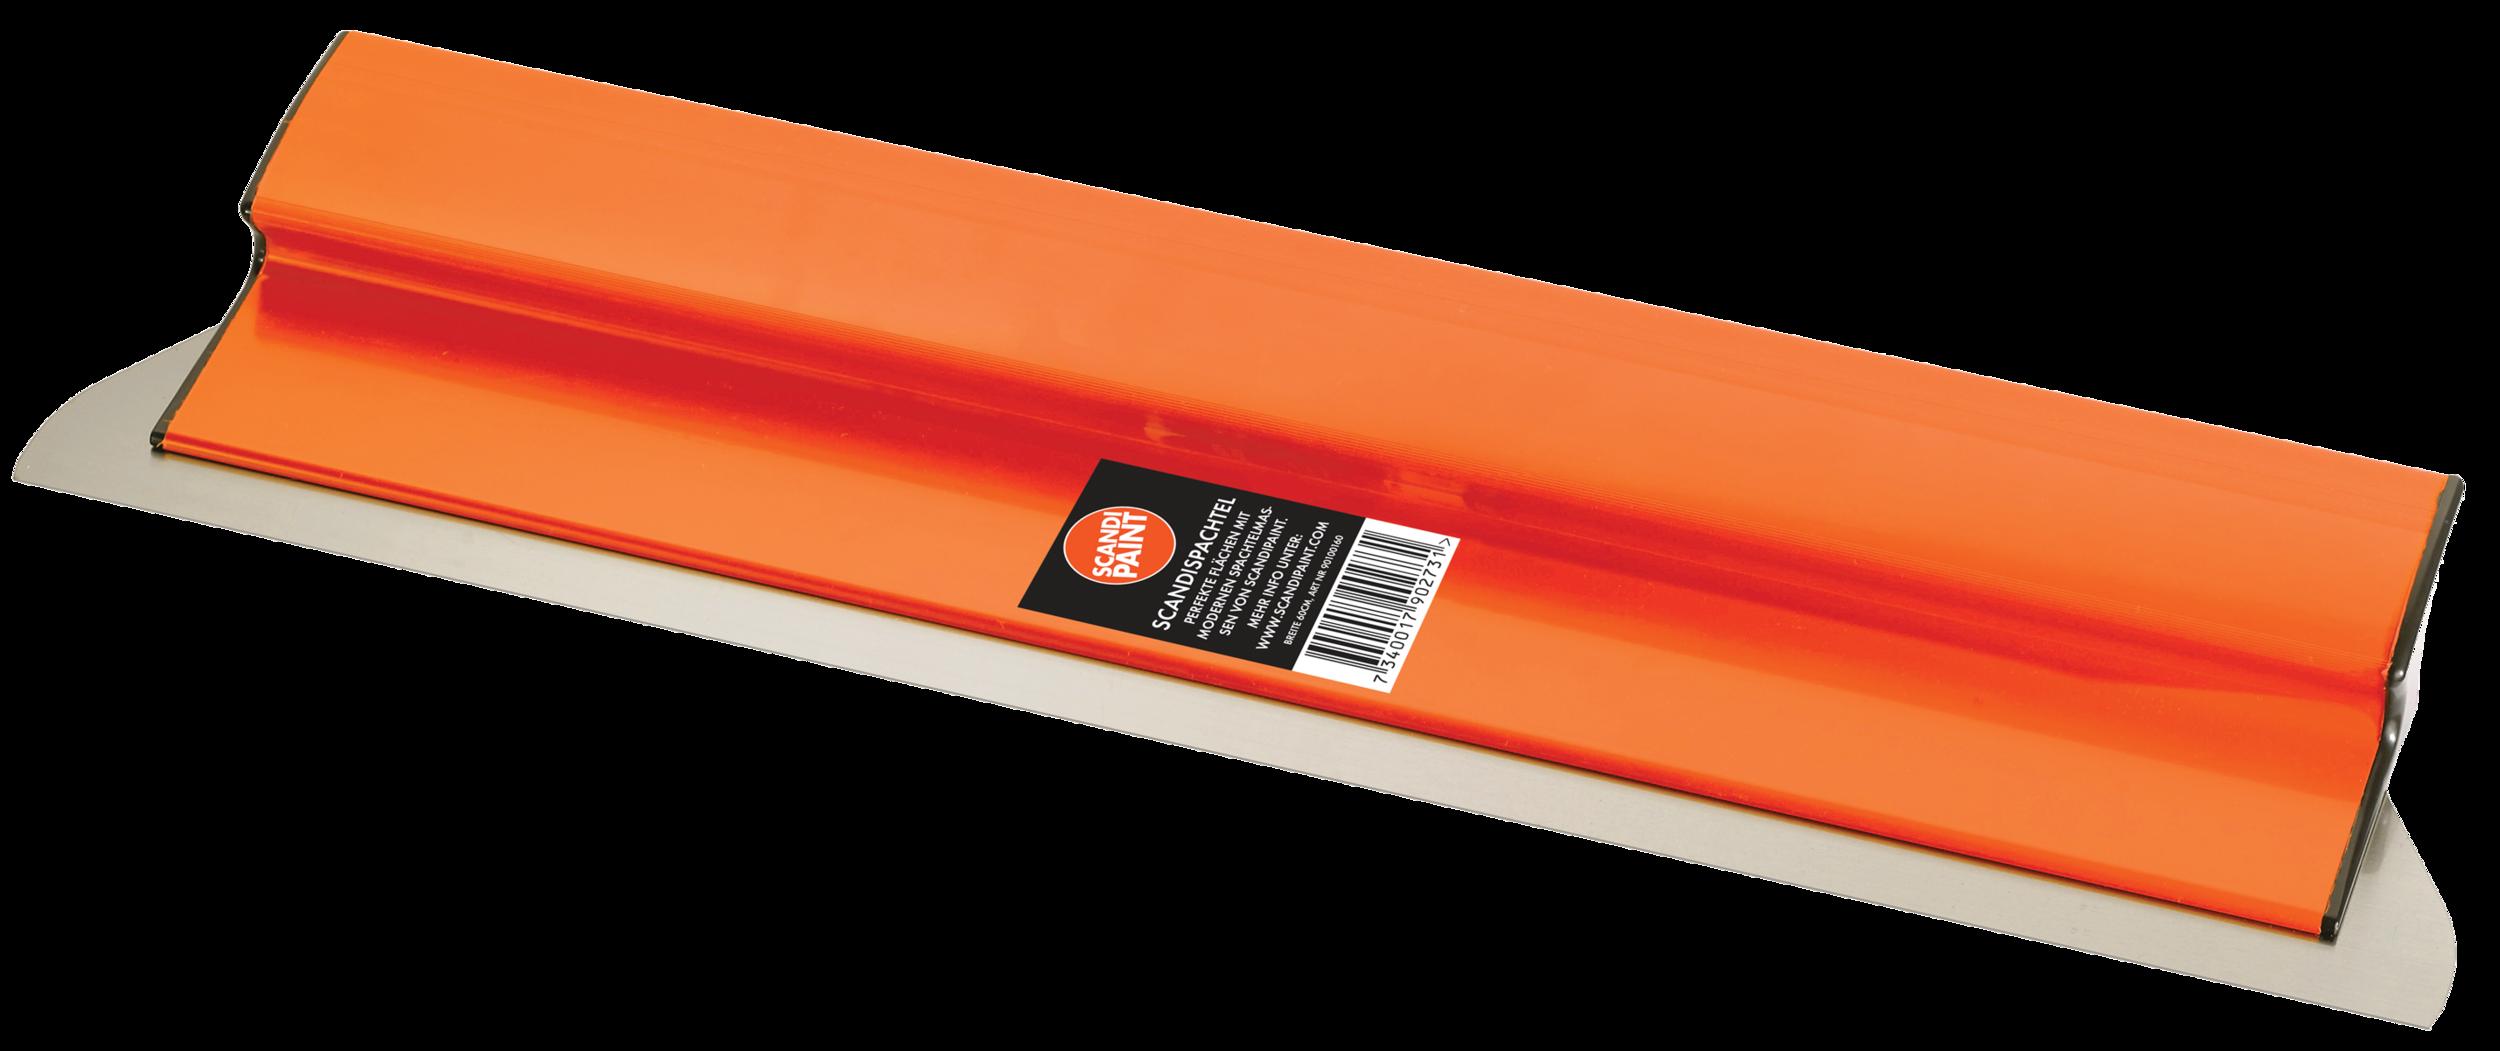 ScandiSpachtel-Orange.png